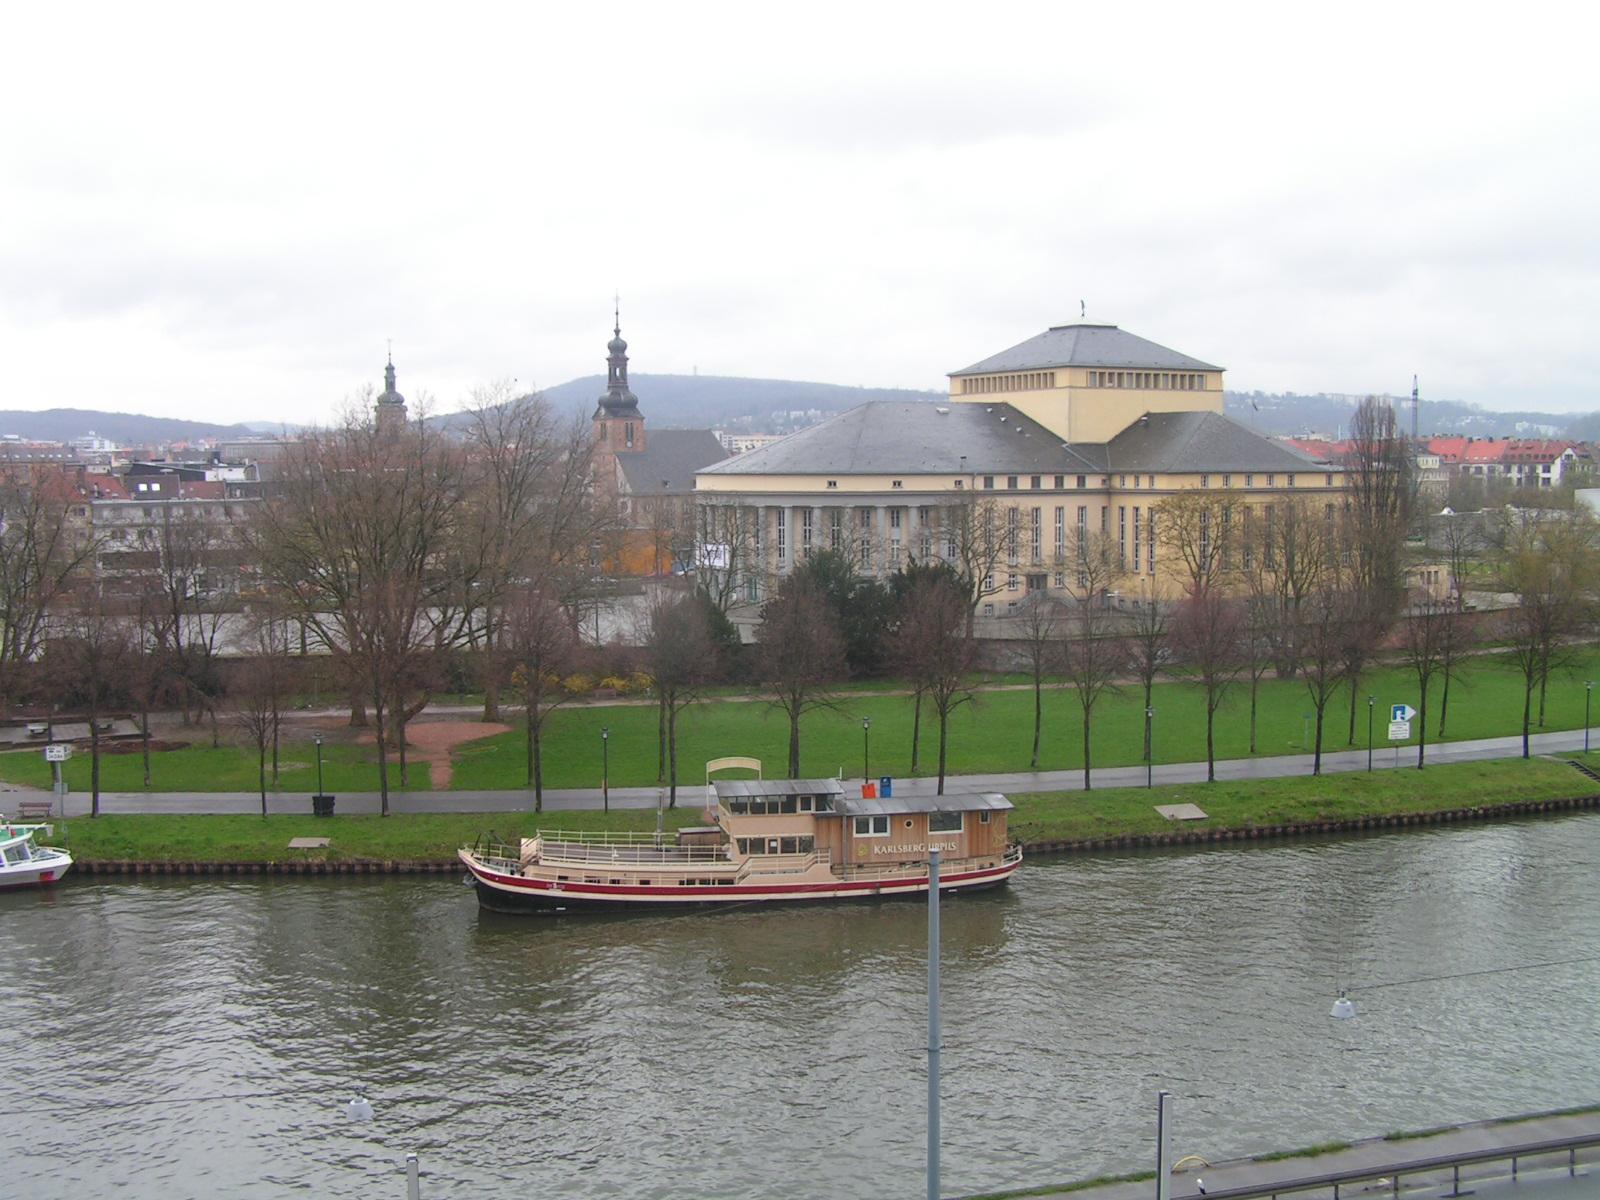 Bild von Saarbrücken: Saarbruecken-StaatsTheater